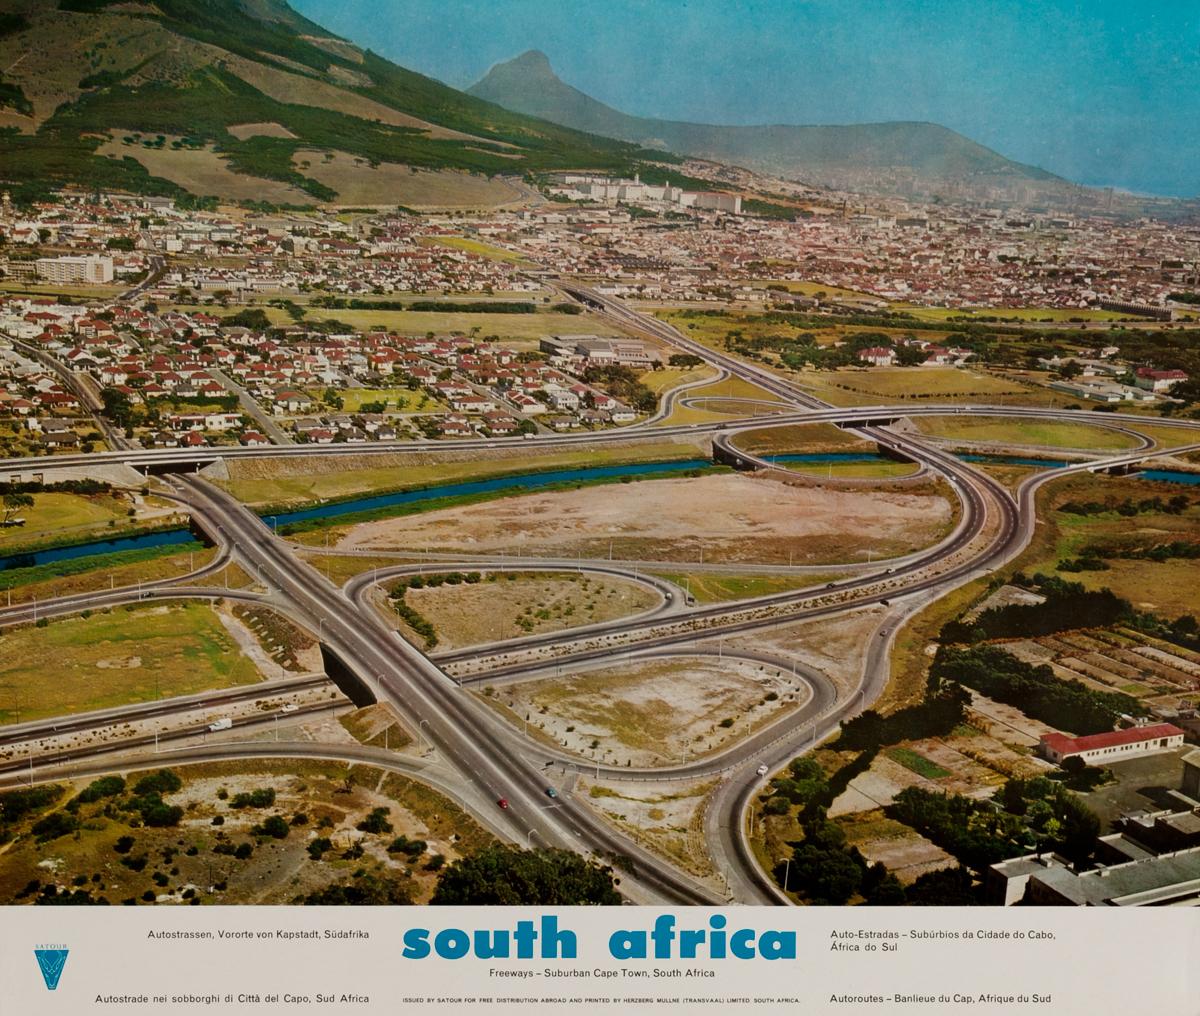 South Africa, Freeways - Suburban Cape Town